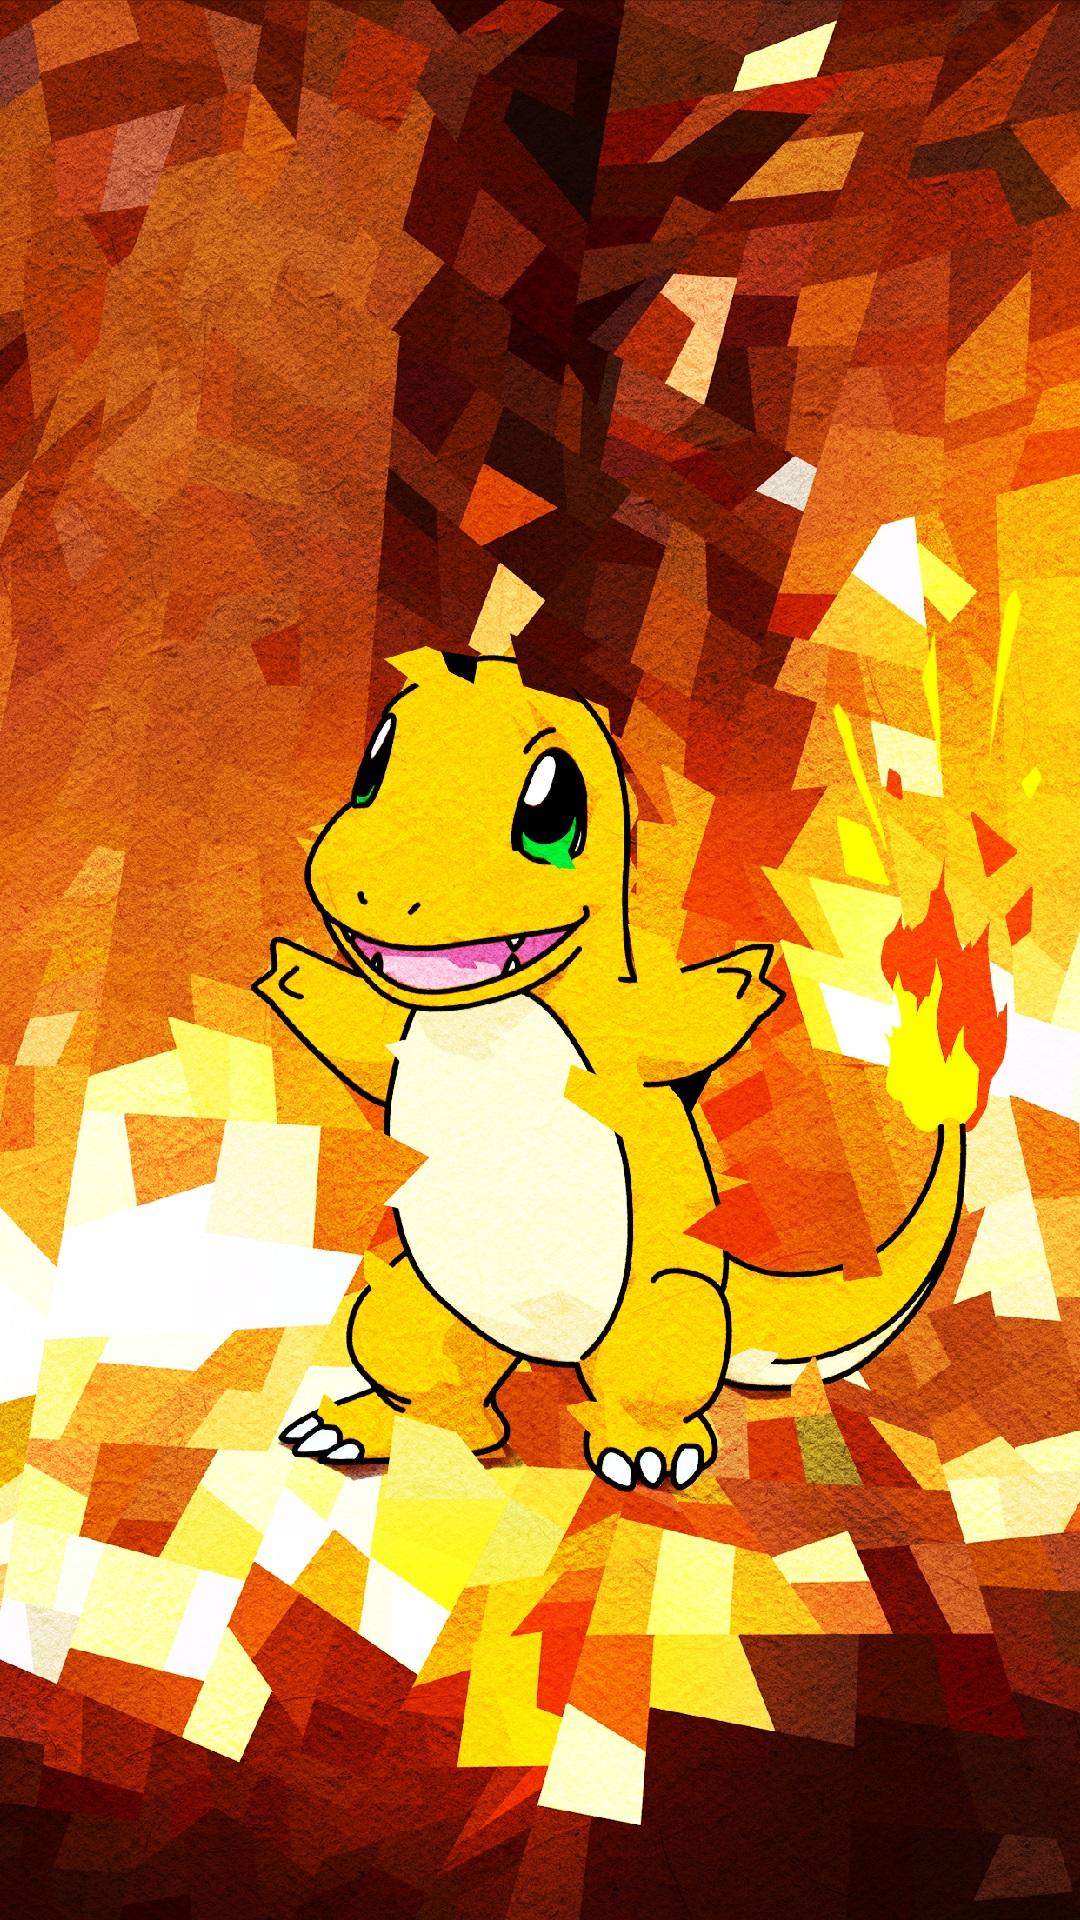 Pokemon Go Charmander fire Iphone hd wallpaper - Wallect